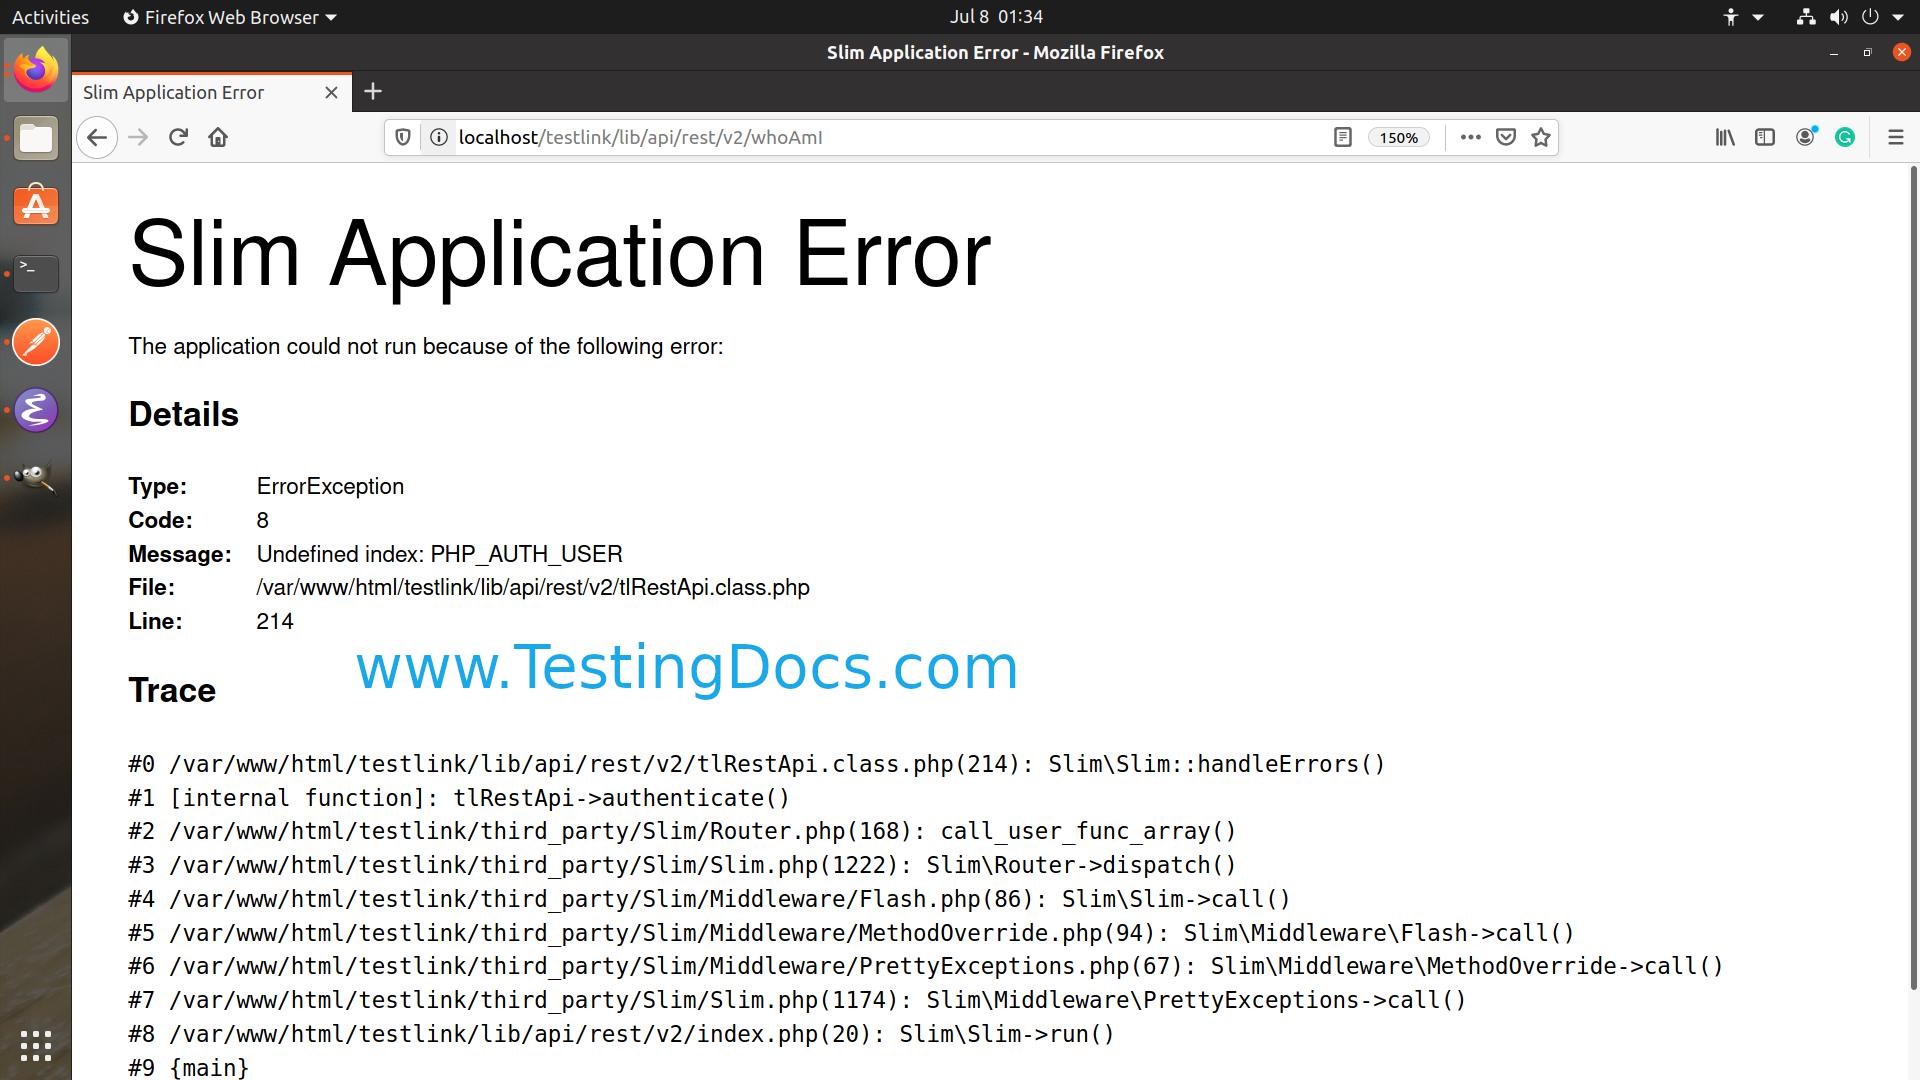 Slim Application Error